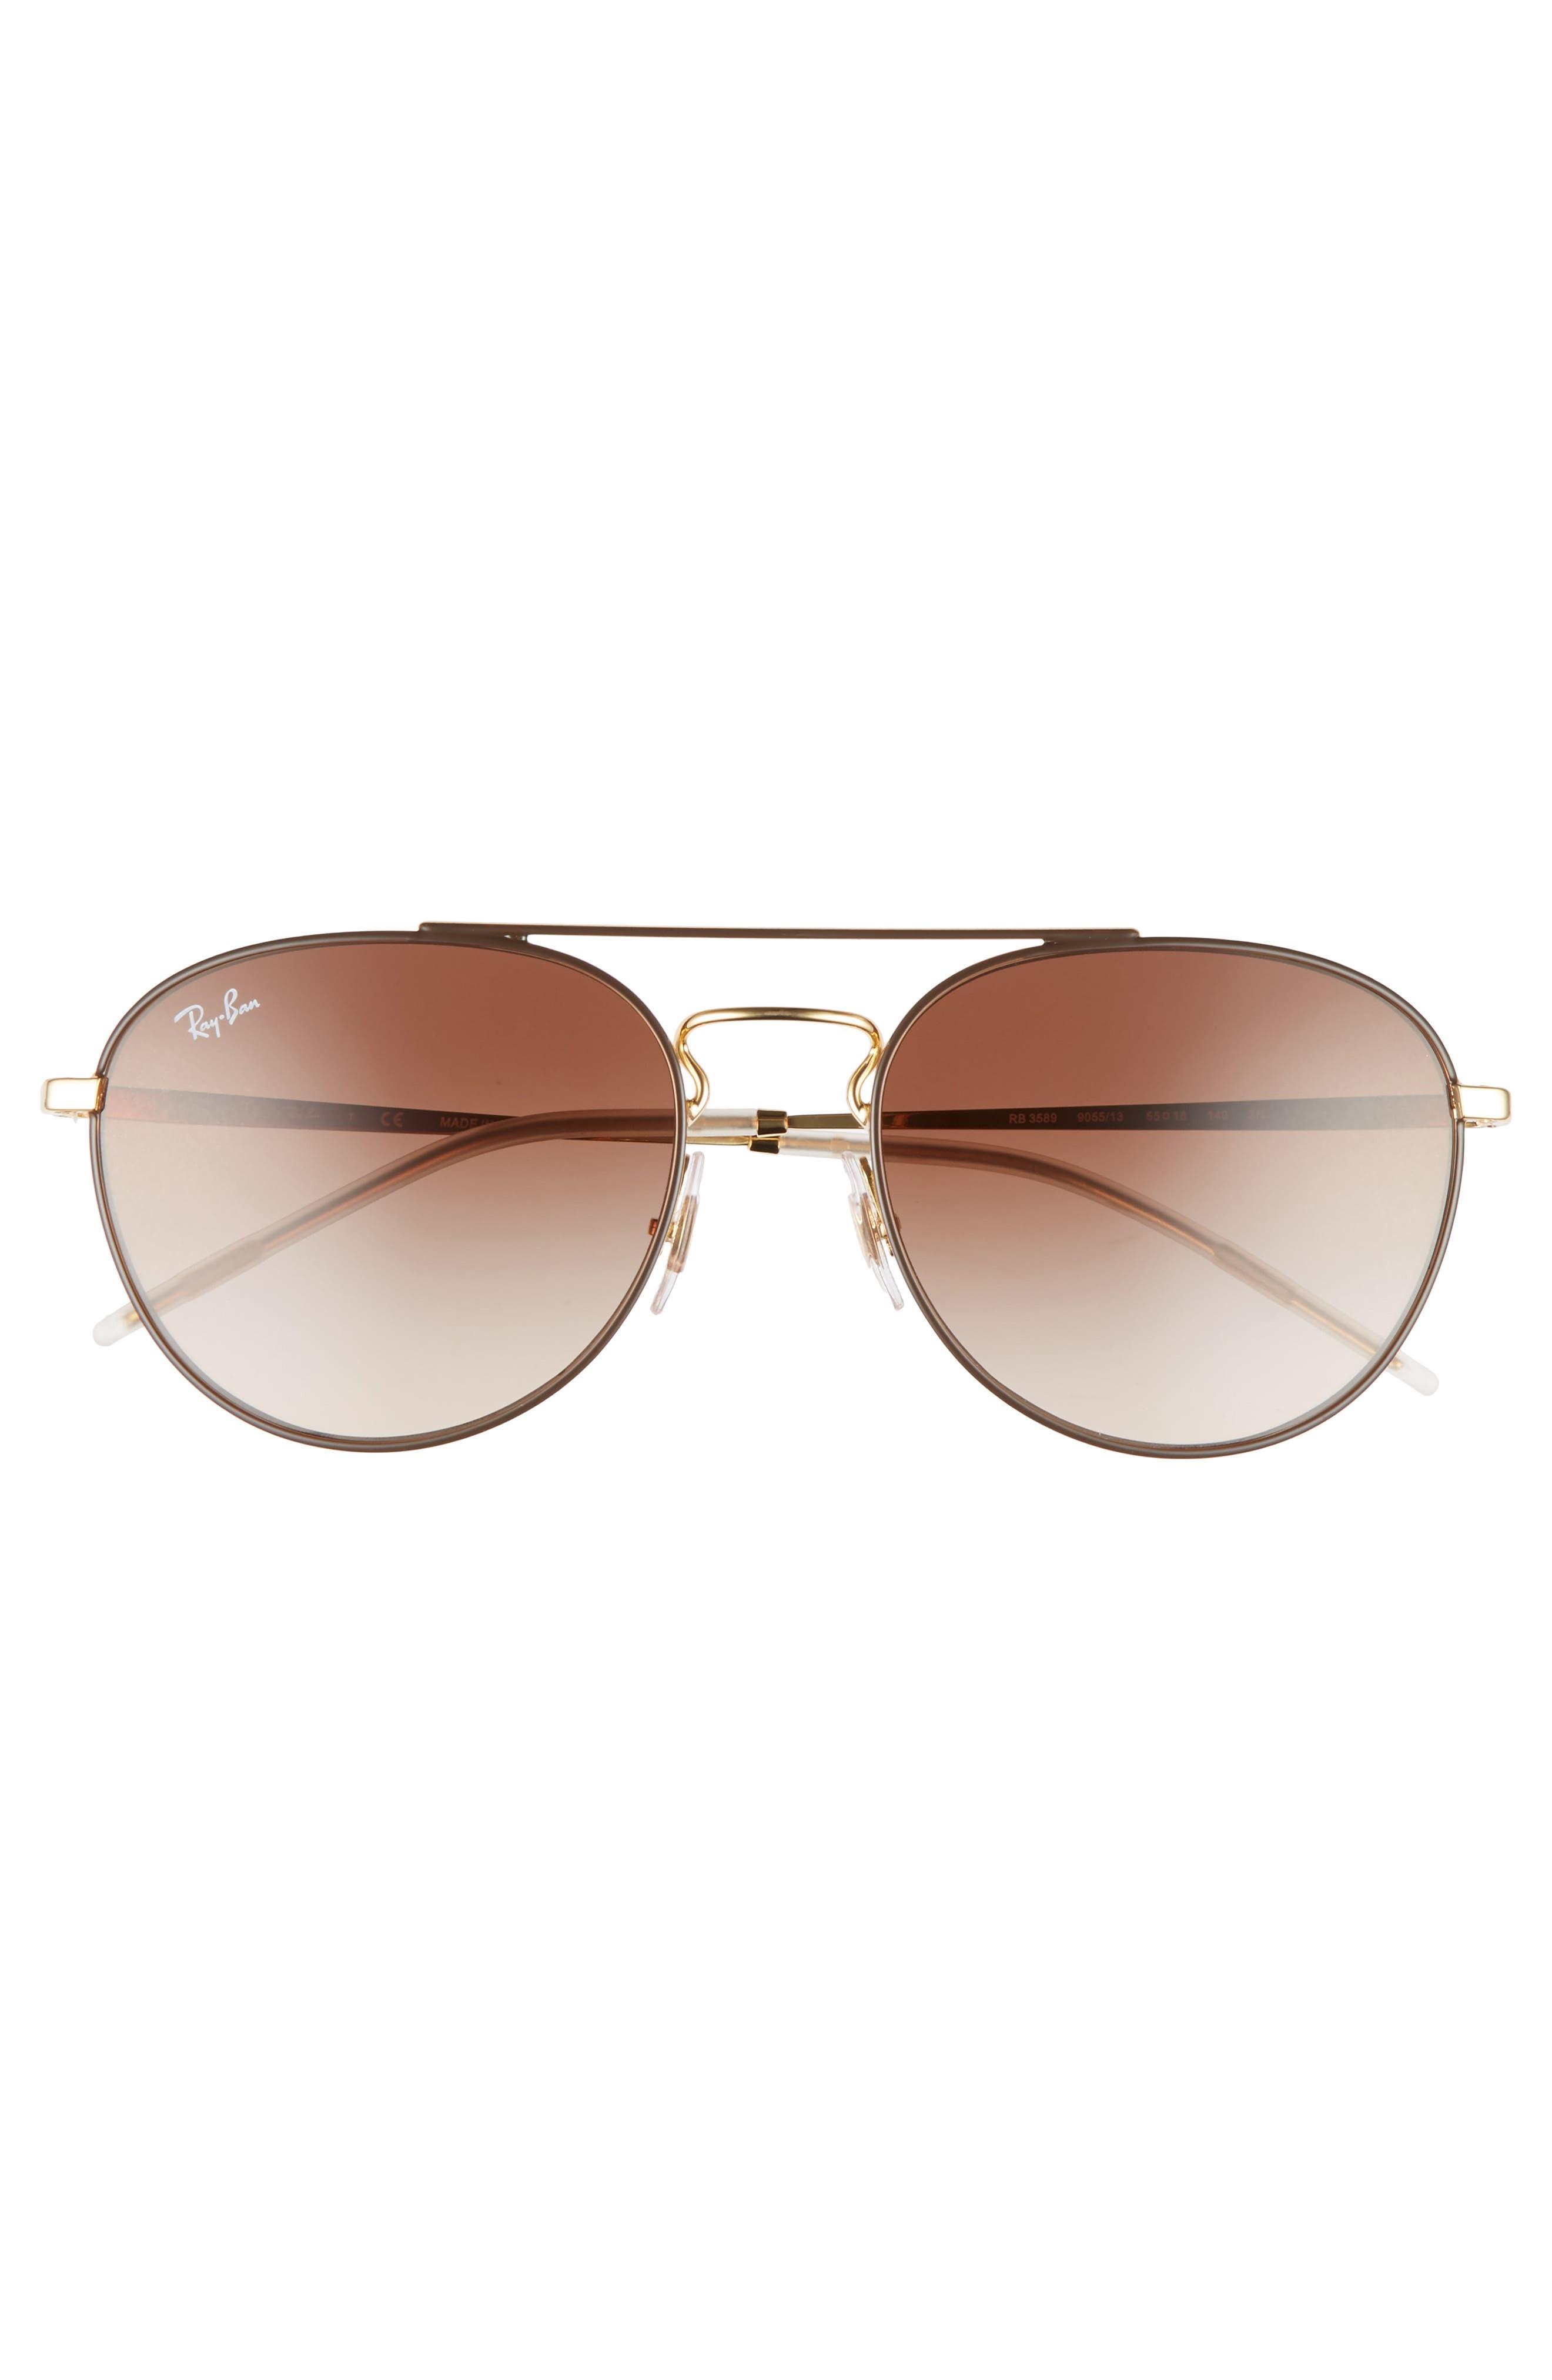 55mm Gradient Lens Round Aviator Sunglasses,                             Alternate thumbnail 3, color,                             Gold Brown